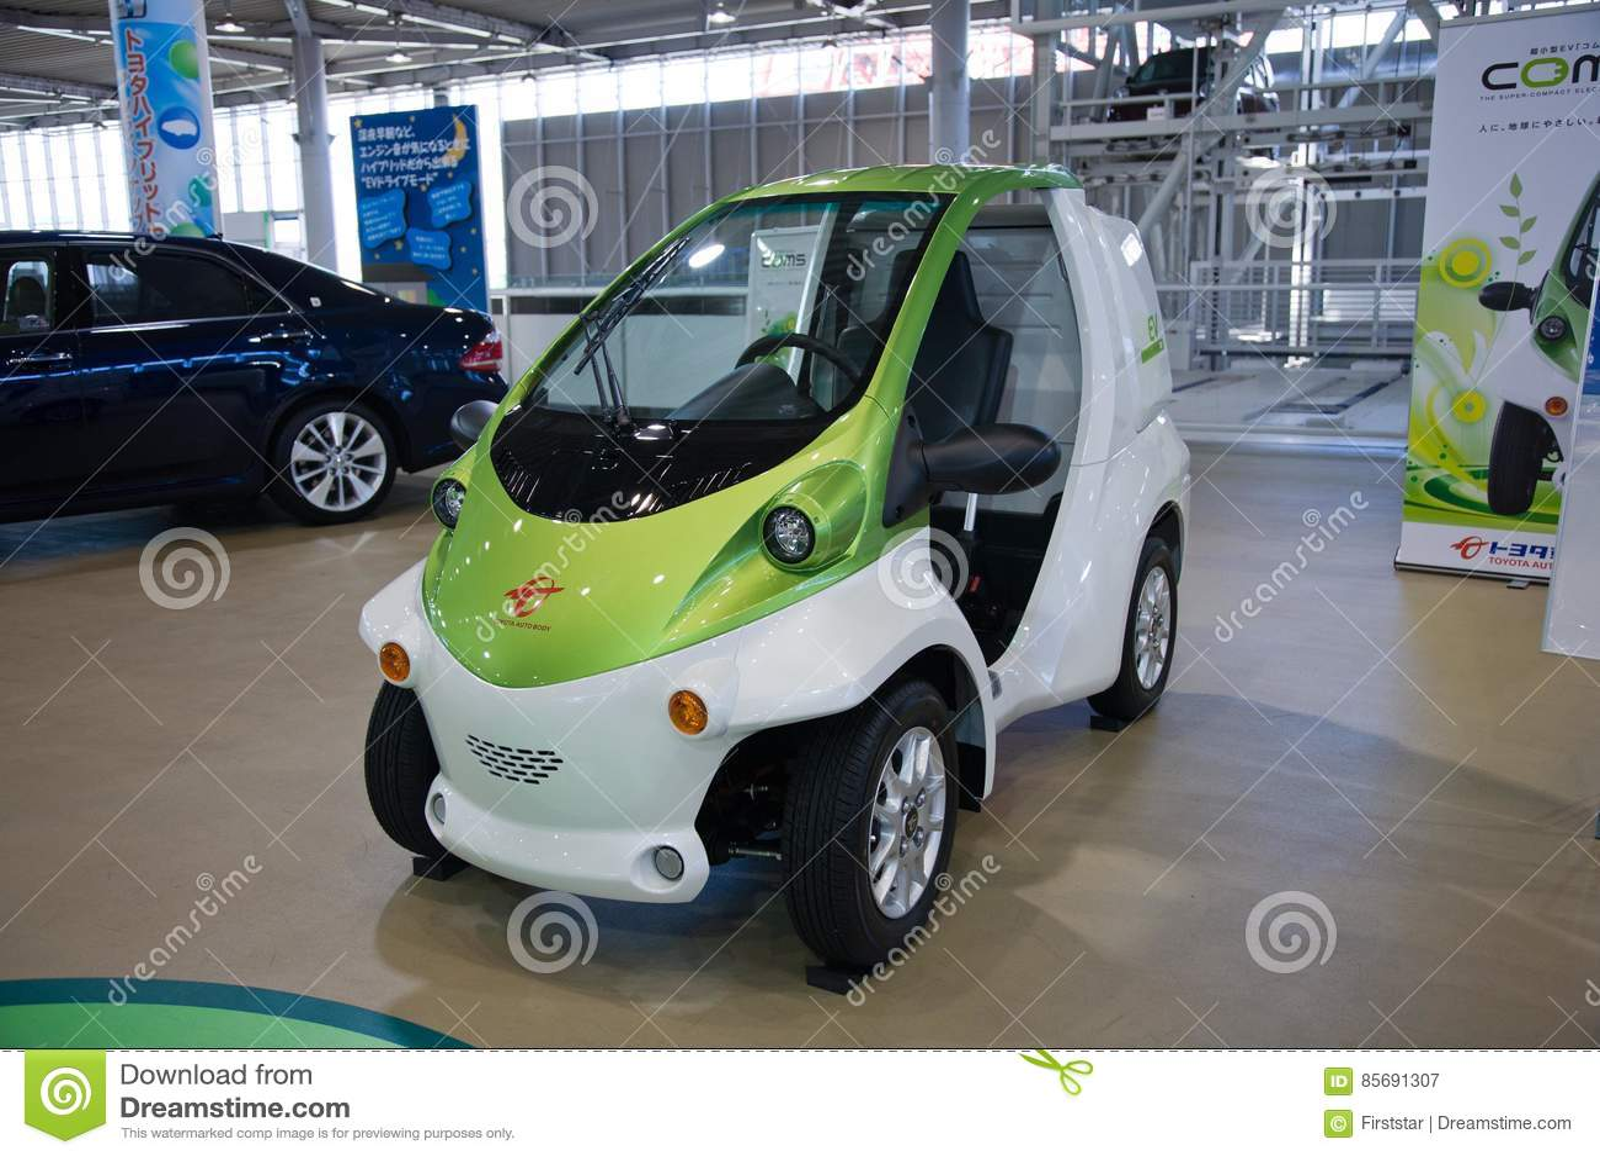 Coms Toyota Auto Body Electro Car Japan Editorial Photography